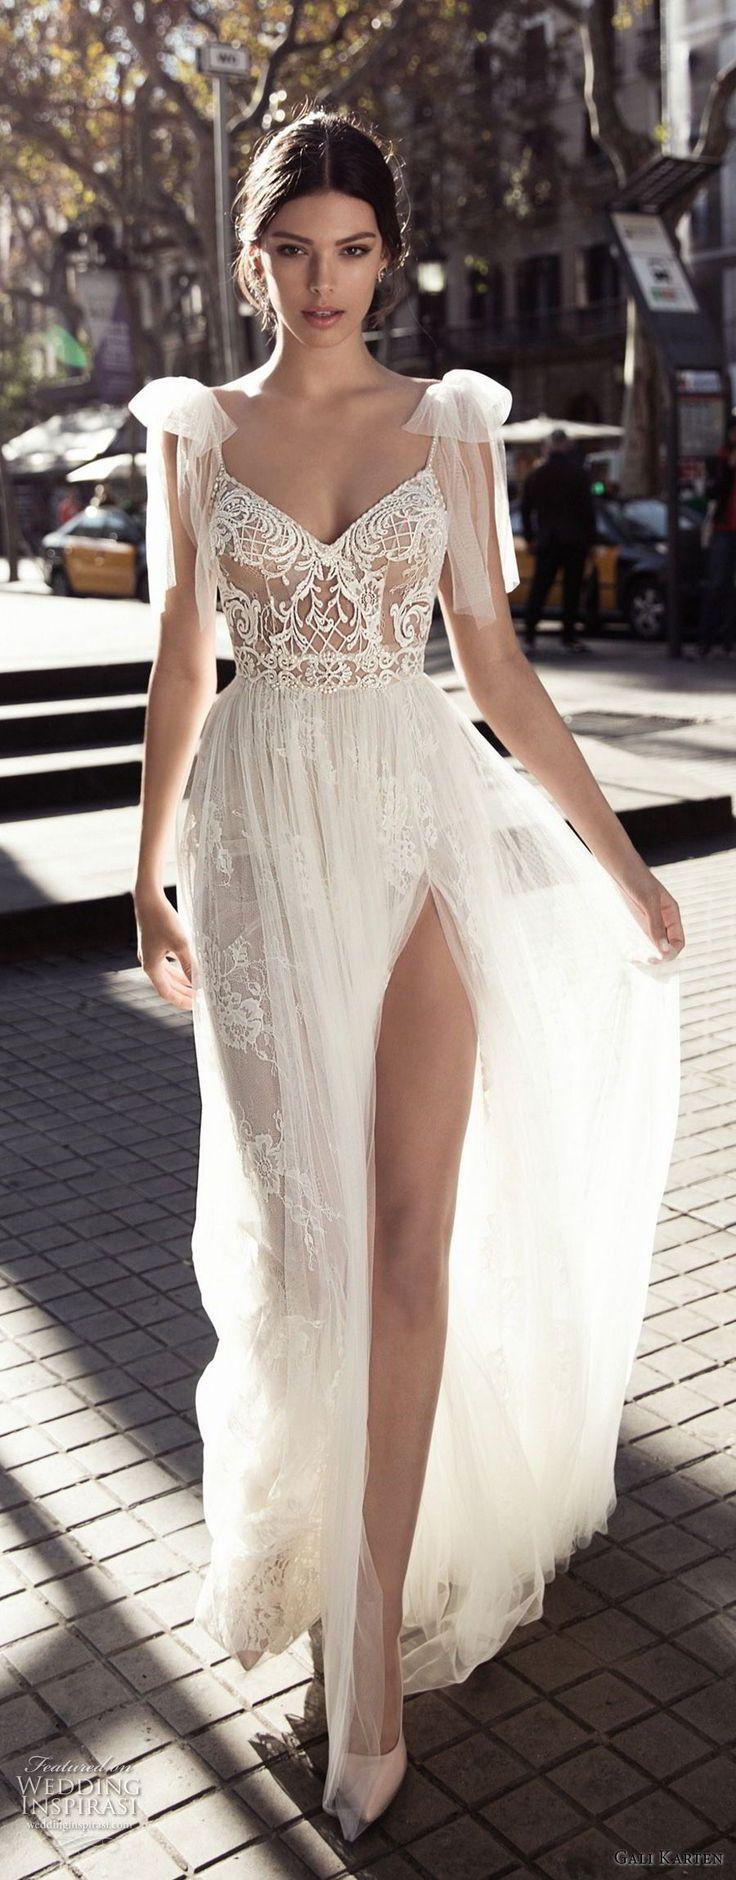 gali karten 2017 bridal cap sleeves thin strap sweetheart neckline heavily embellished bodice side slit tulle skirt romantic a line weddind dress open v back sweep train (5) mv